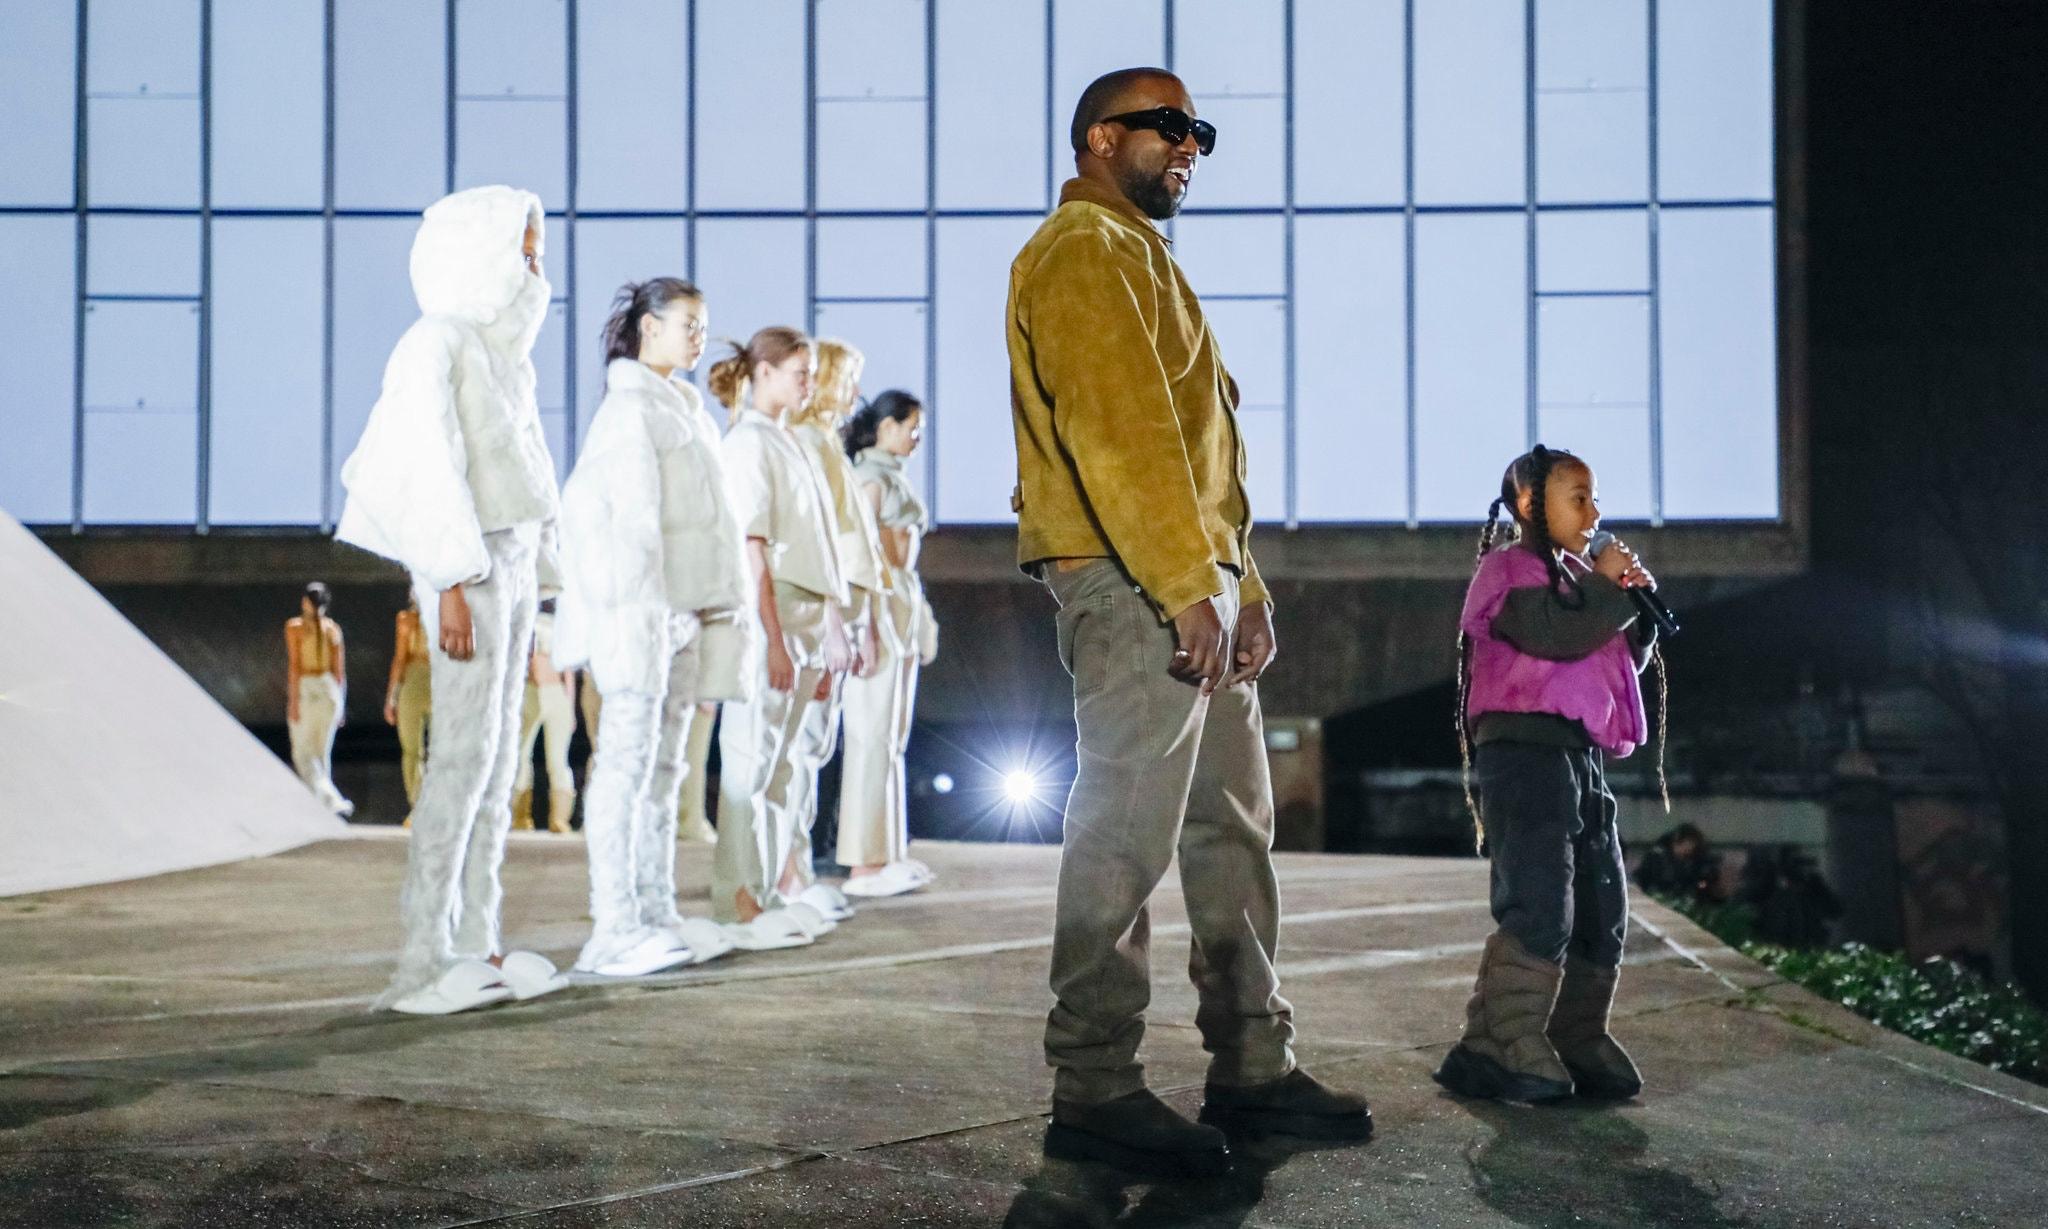 Kanye West 品牌 Yeezy 与 Gap 达成十年合作协议